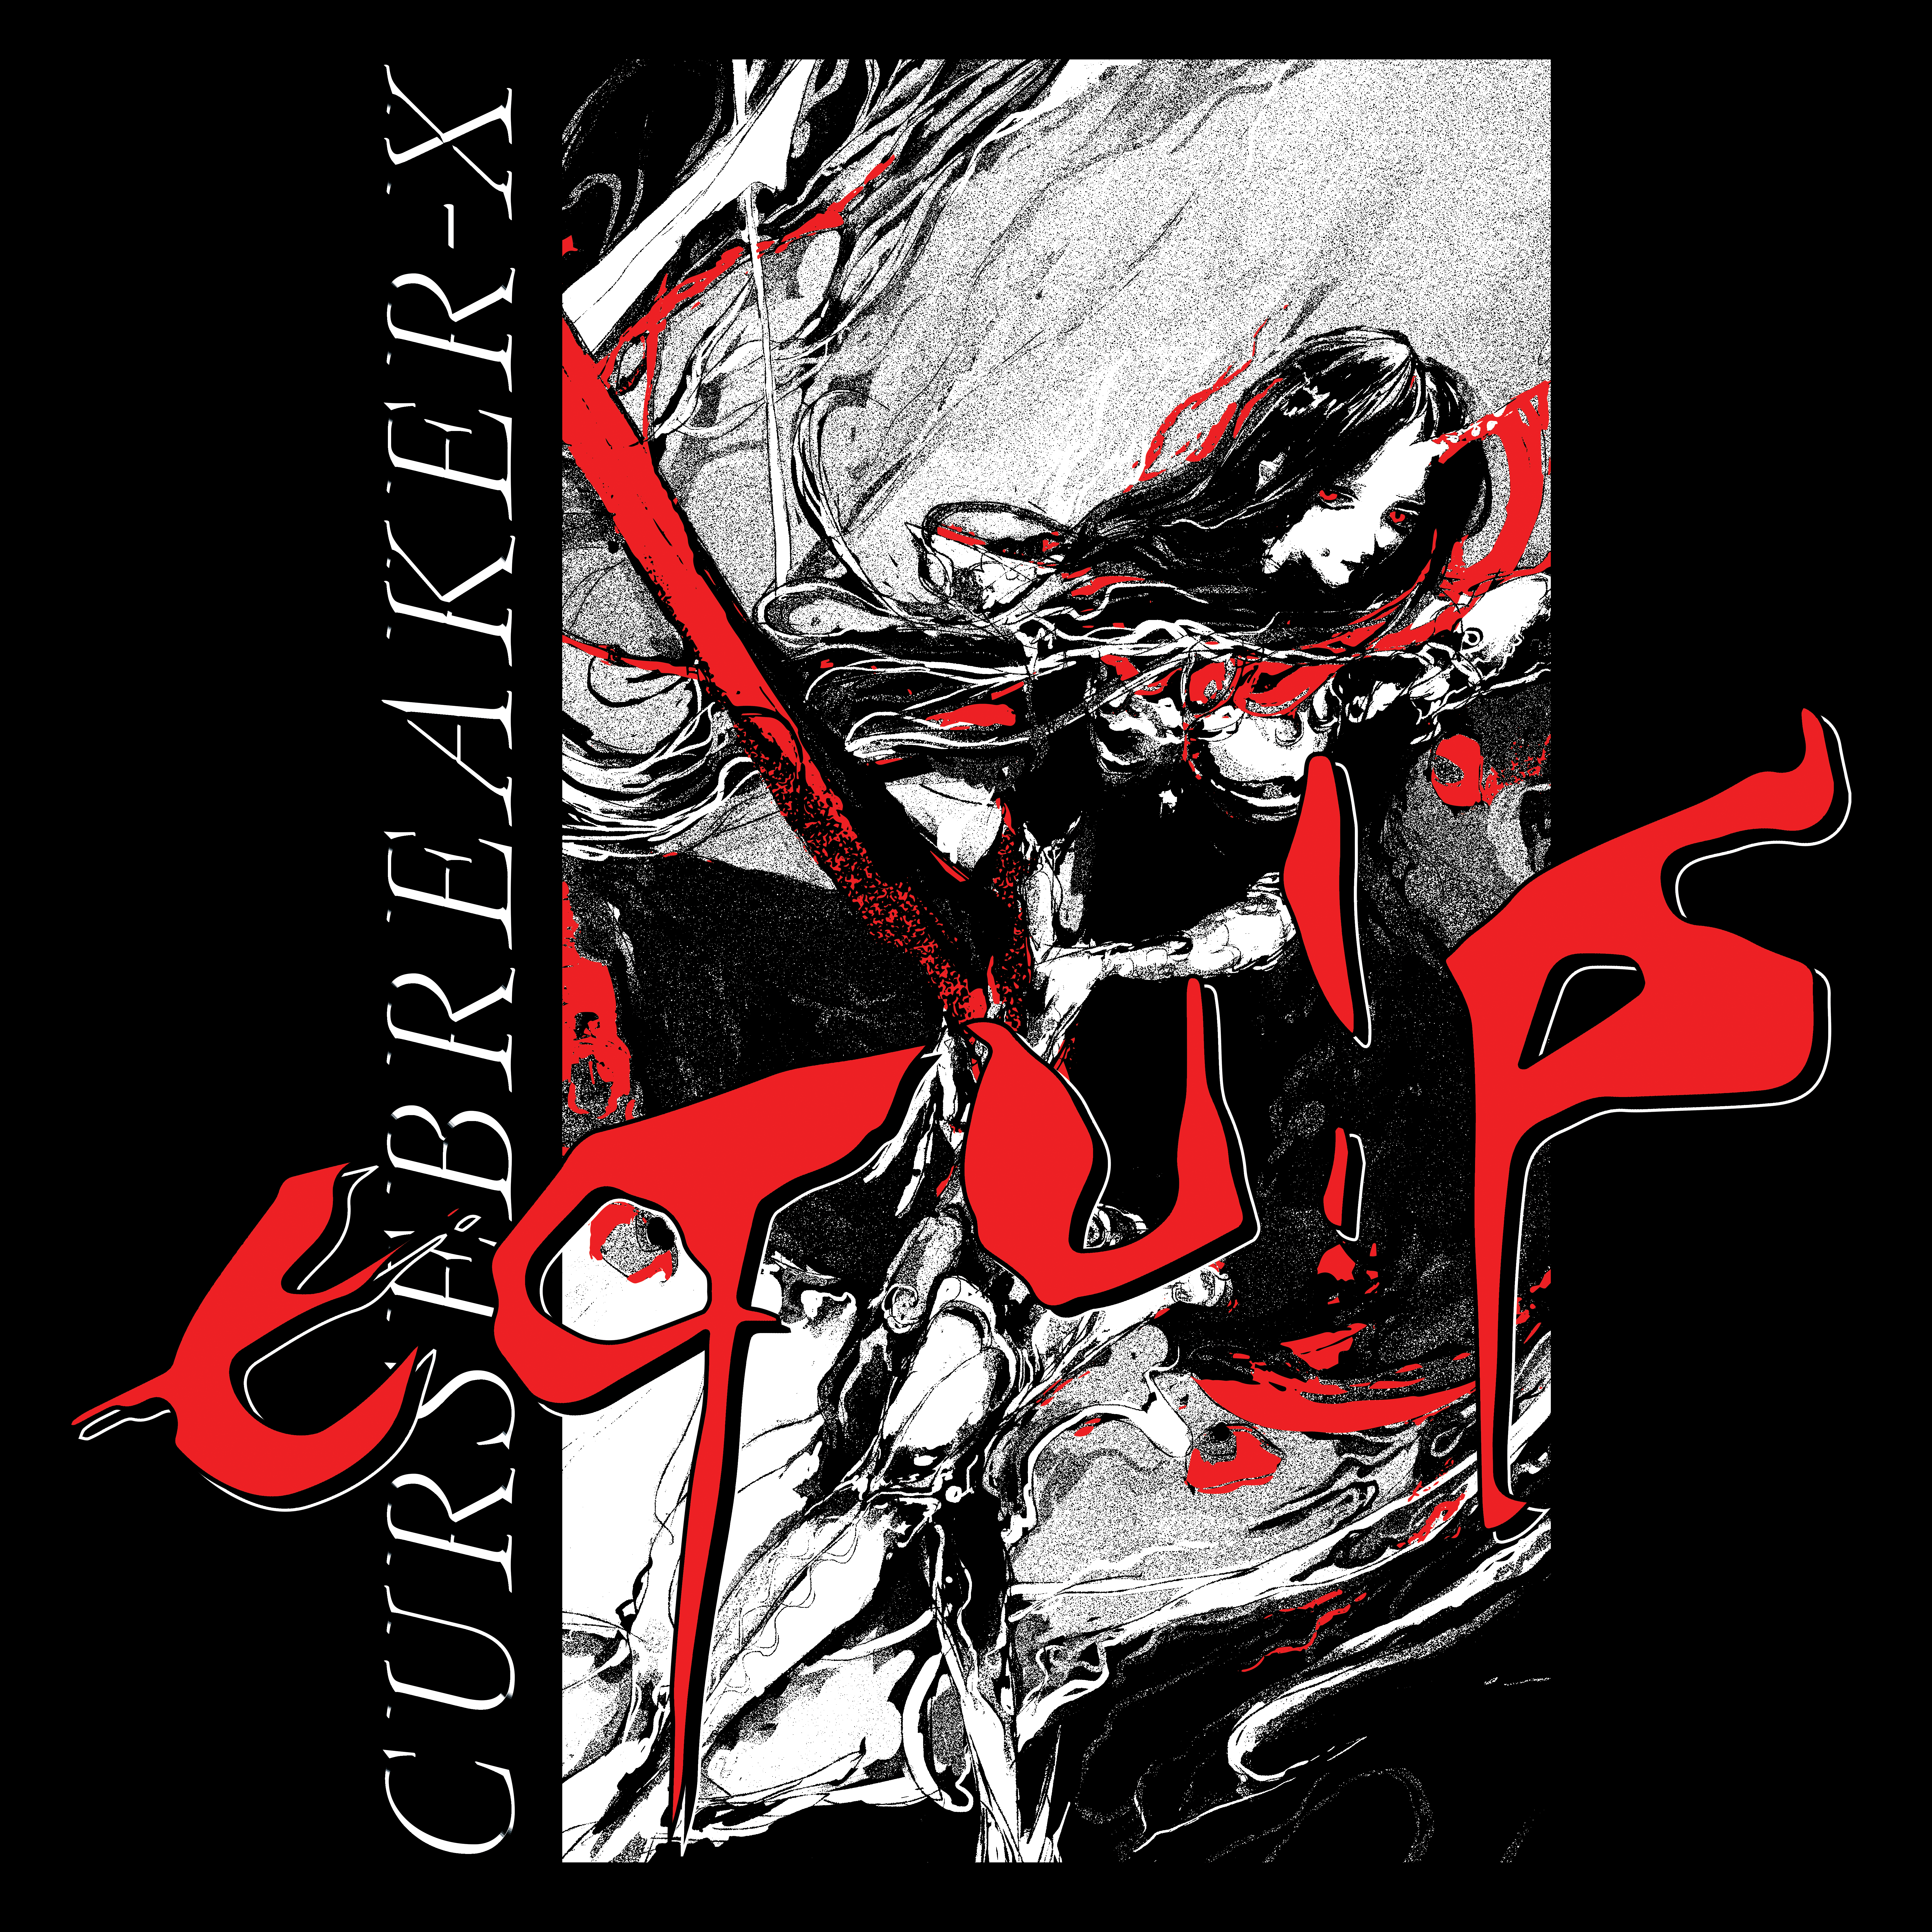 Equip Shirt (Collaboration with Banichan